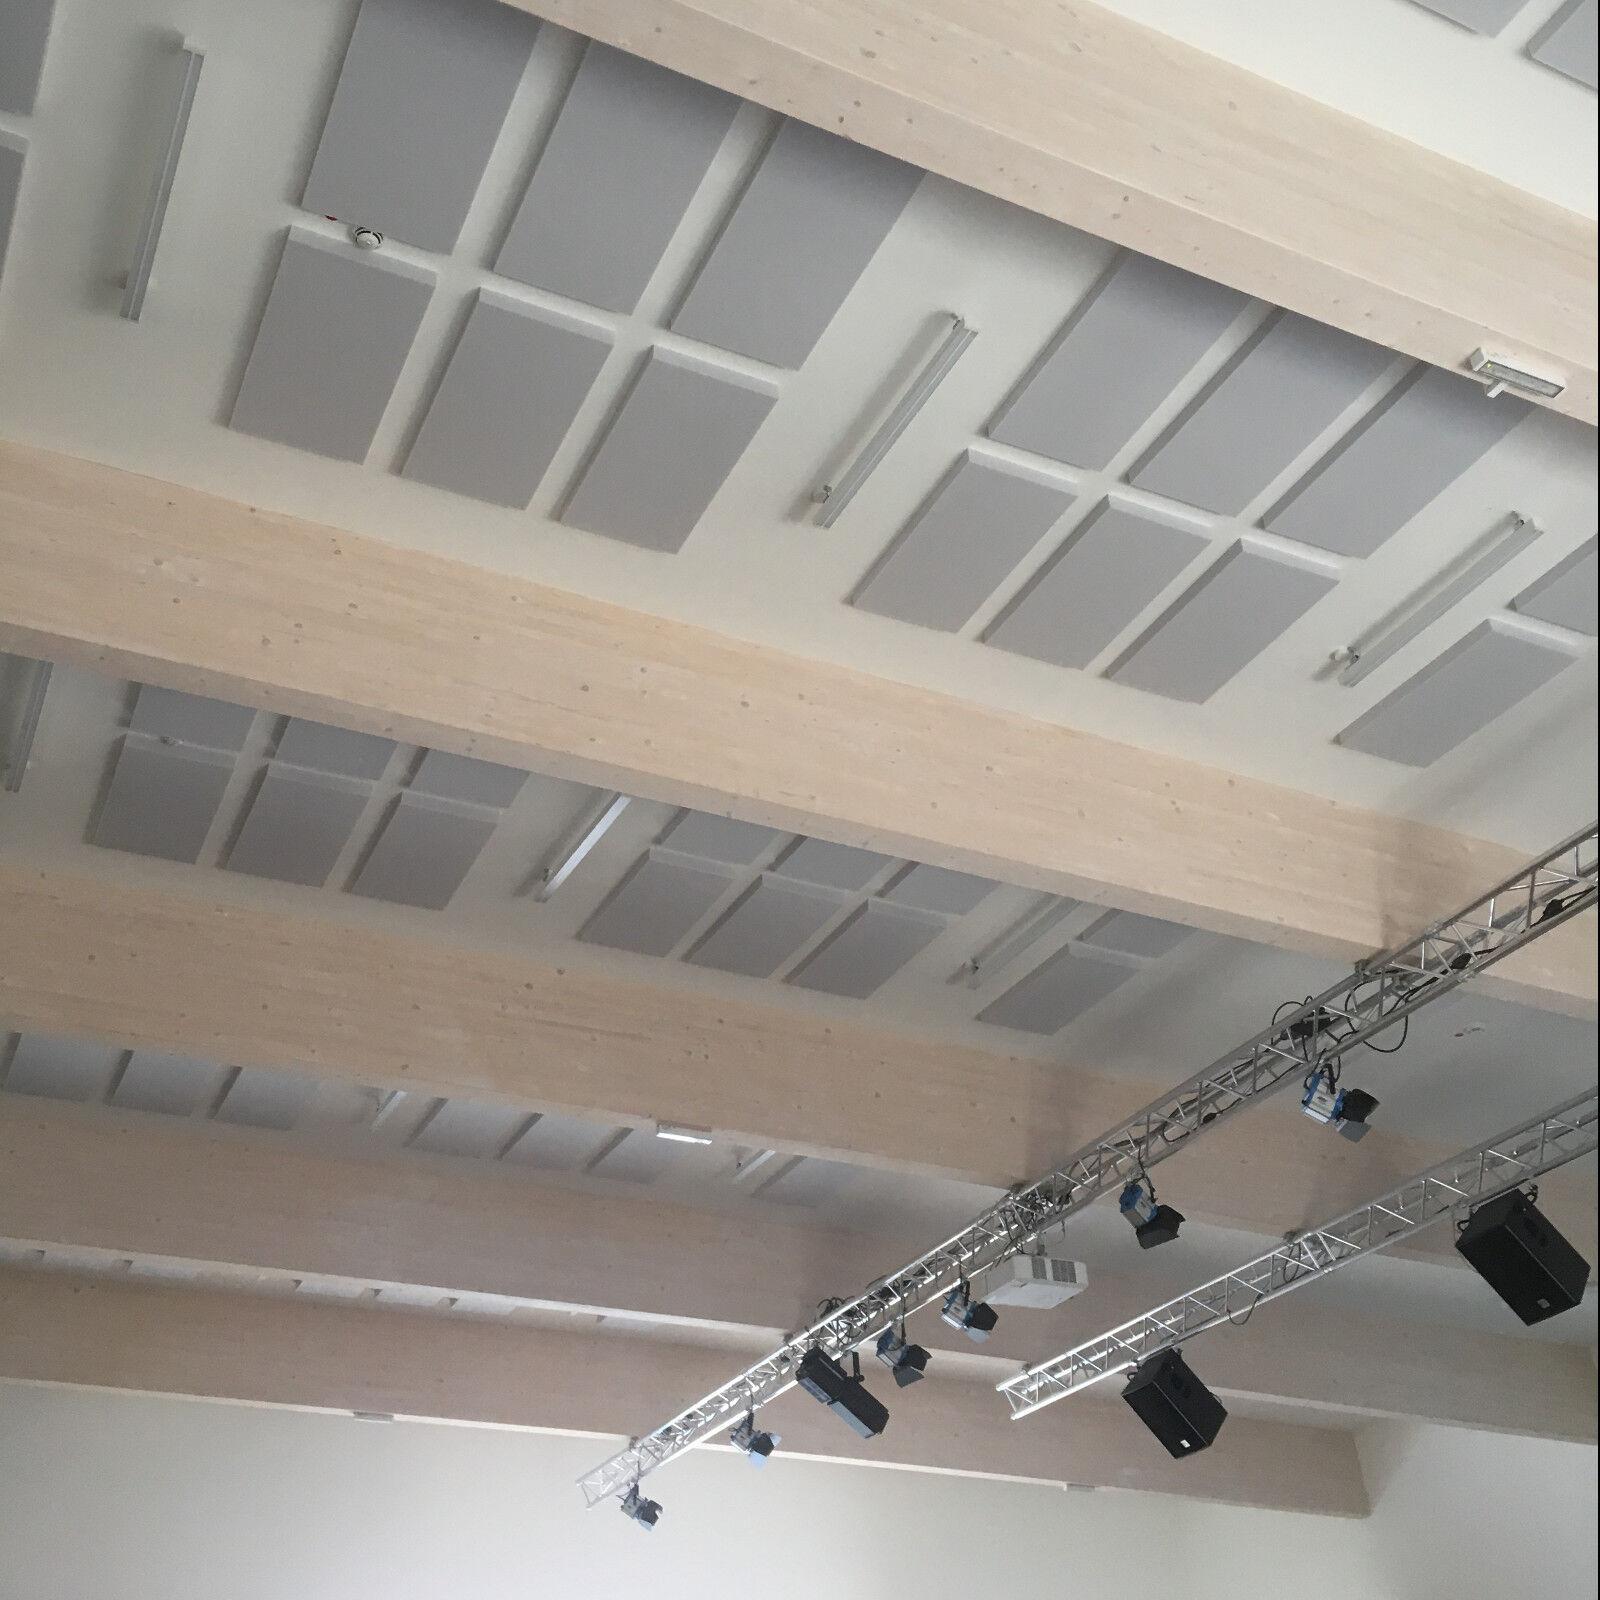 4x tonstudio schall akustik absorber d mmung 100x50x10 aus basotect g hellgrau eur 169 90. Black Bedroom Furniture Sets. Home Design Ideas